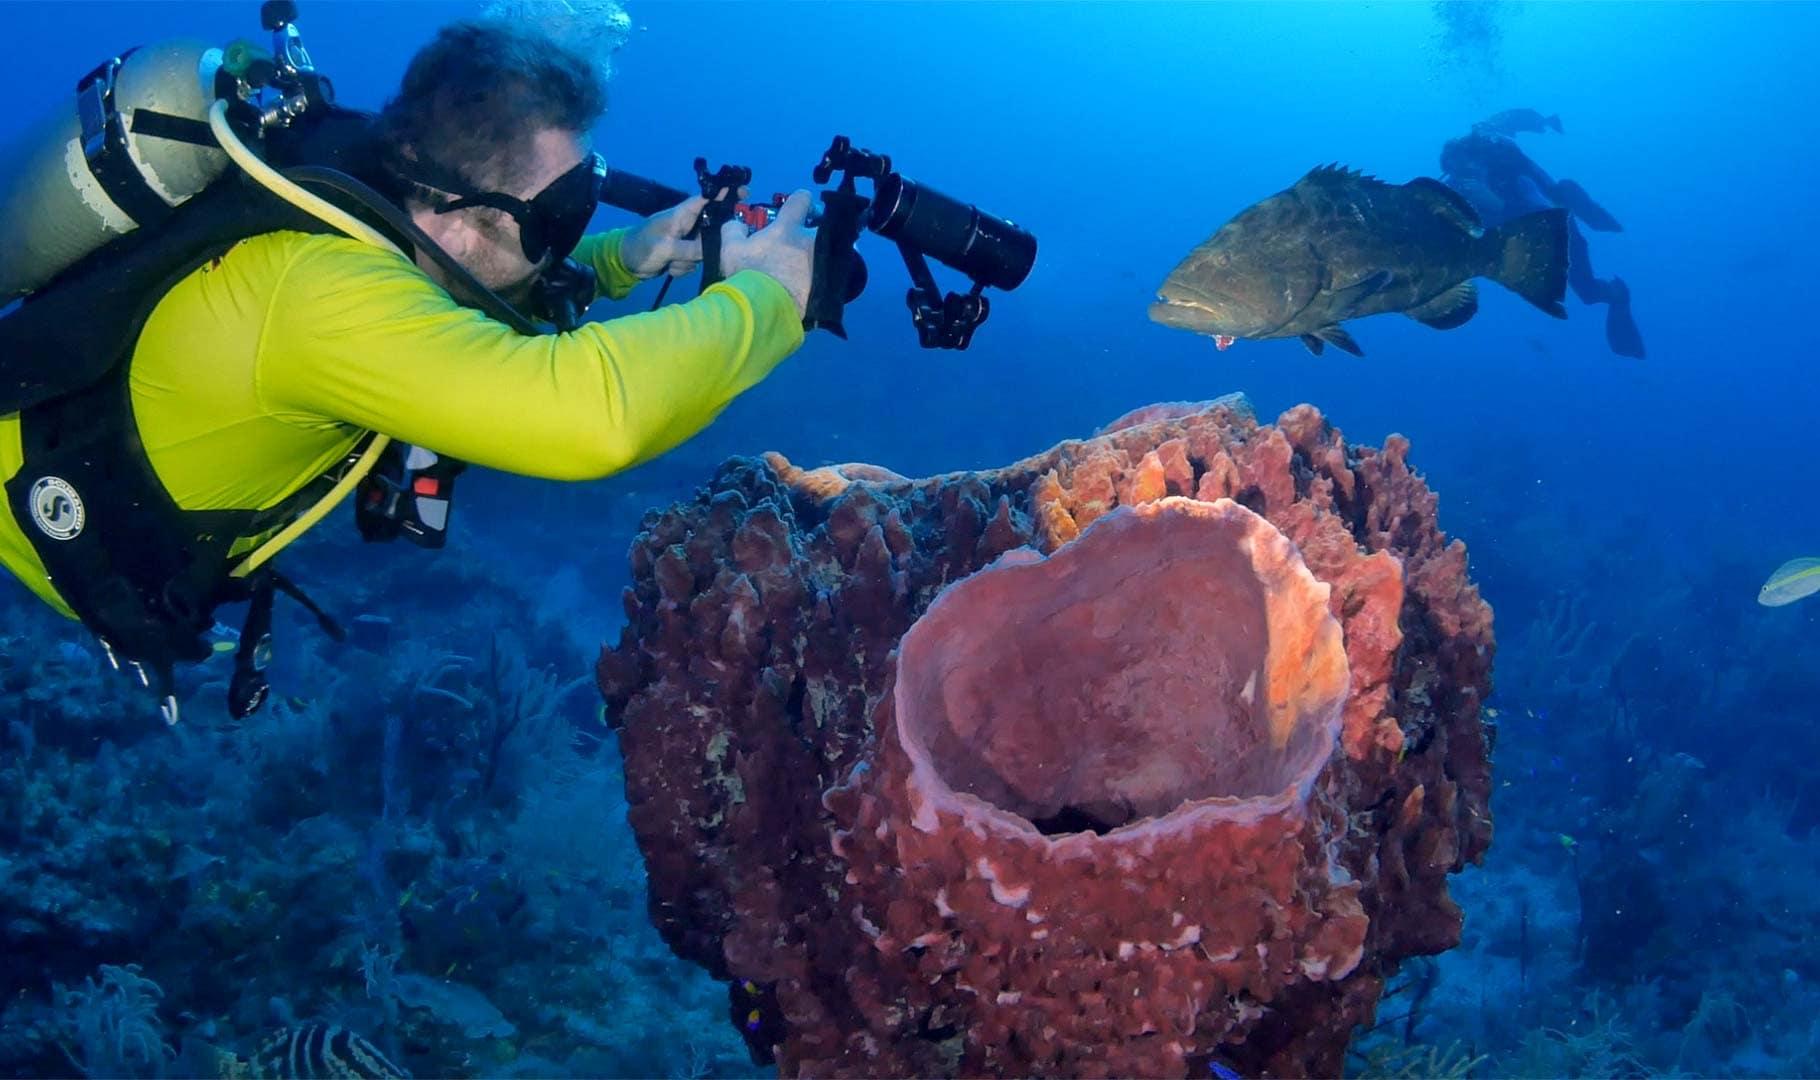 Diver off the Cuban scuba diving liveaboard taking a picture of a black grouper